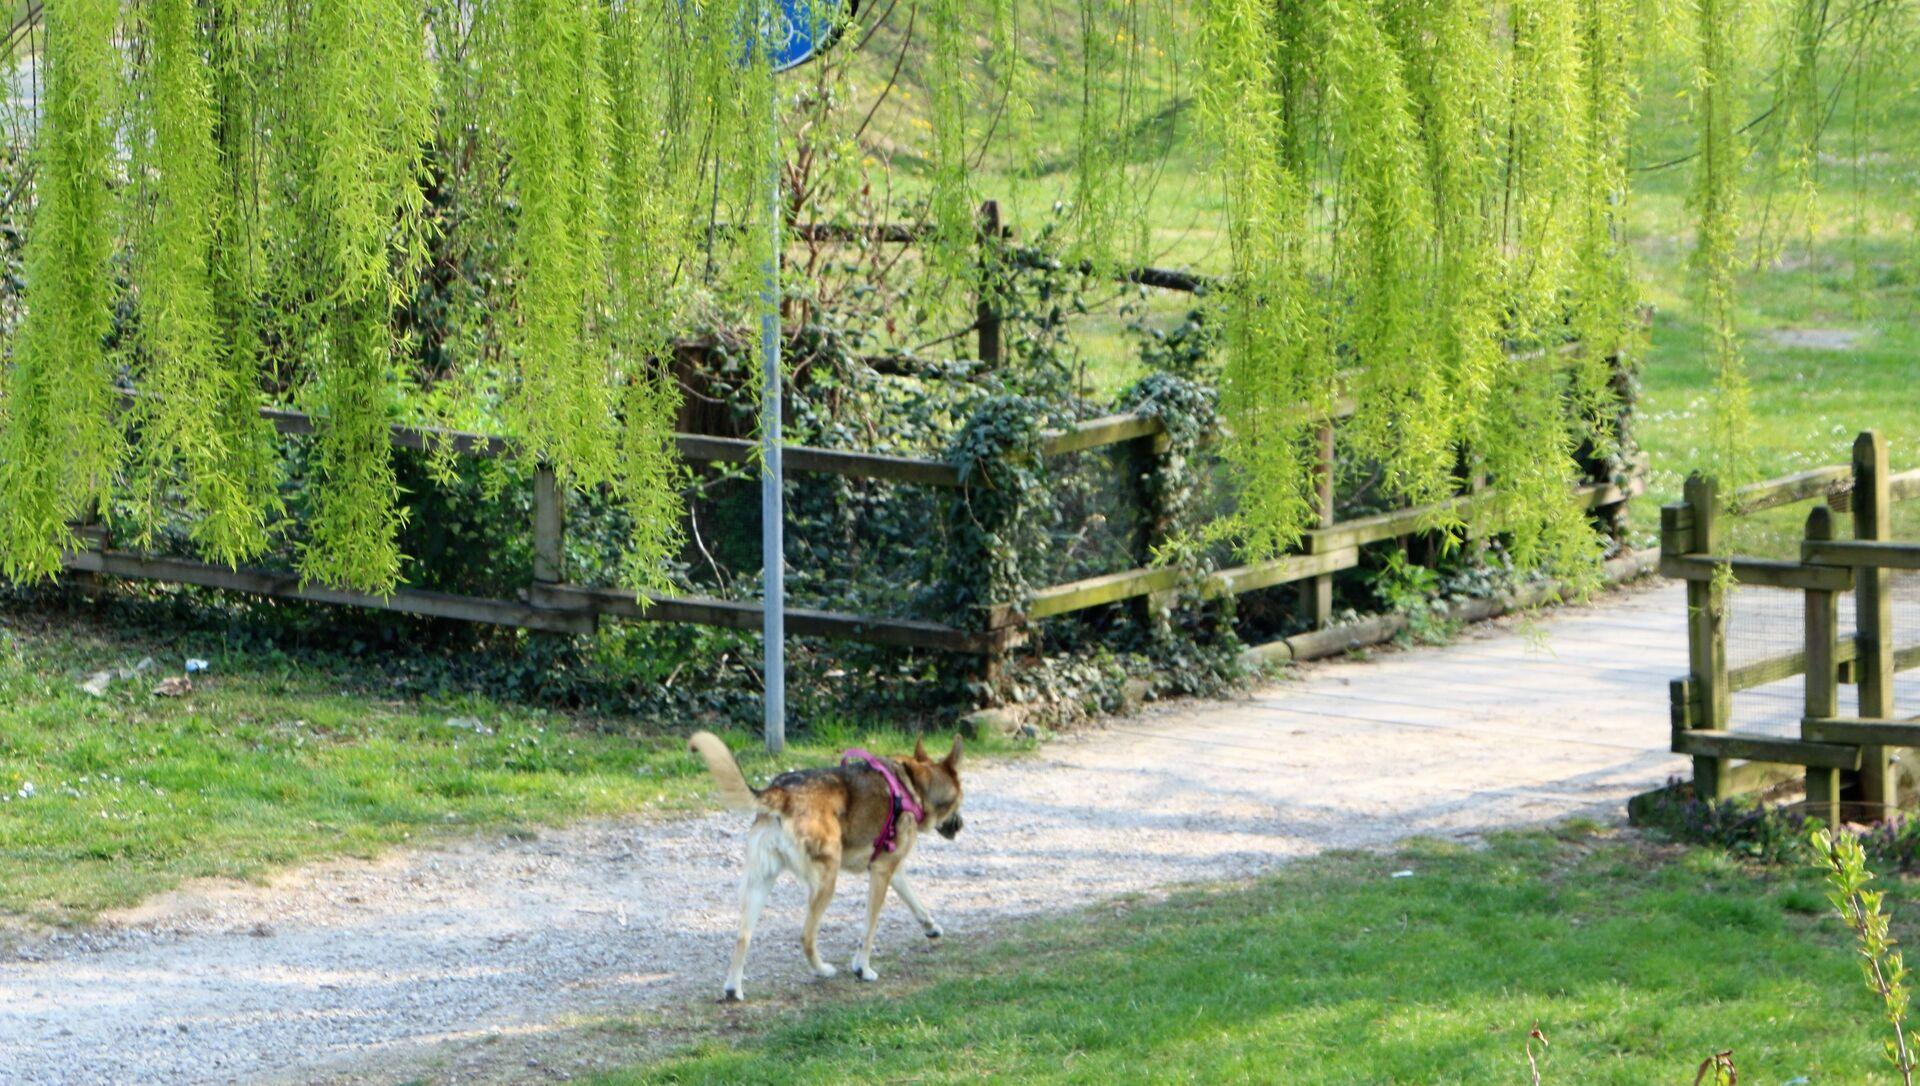 Un cane in un parco  - Sputnik Italia, 1920, 14.05.2021